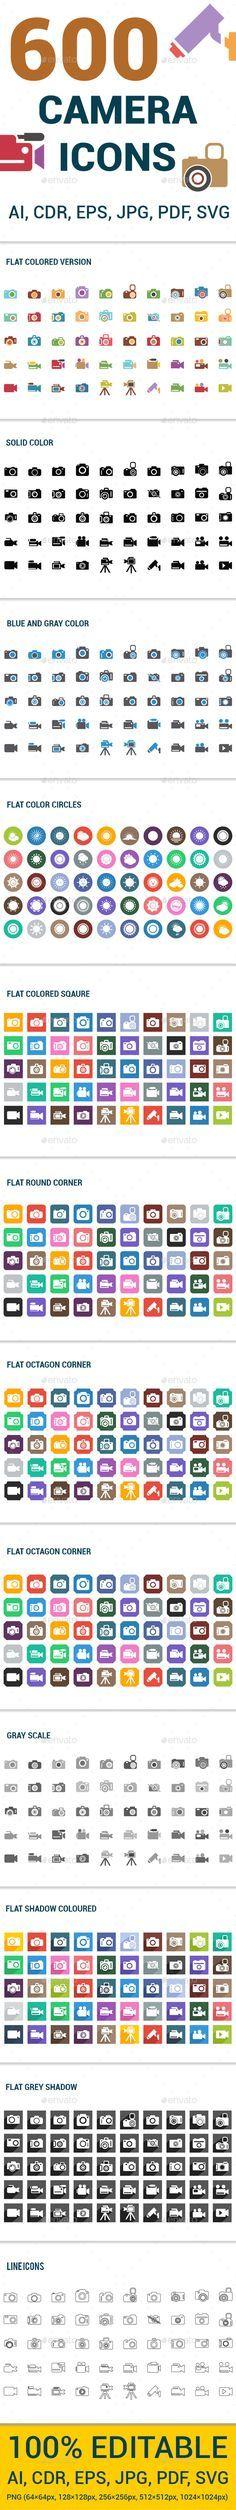 600 Camera Icons Set #design Download: http://graphicriver.net/item/600-camera-icons-set/13290381?ref=ksioks